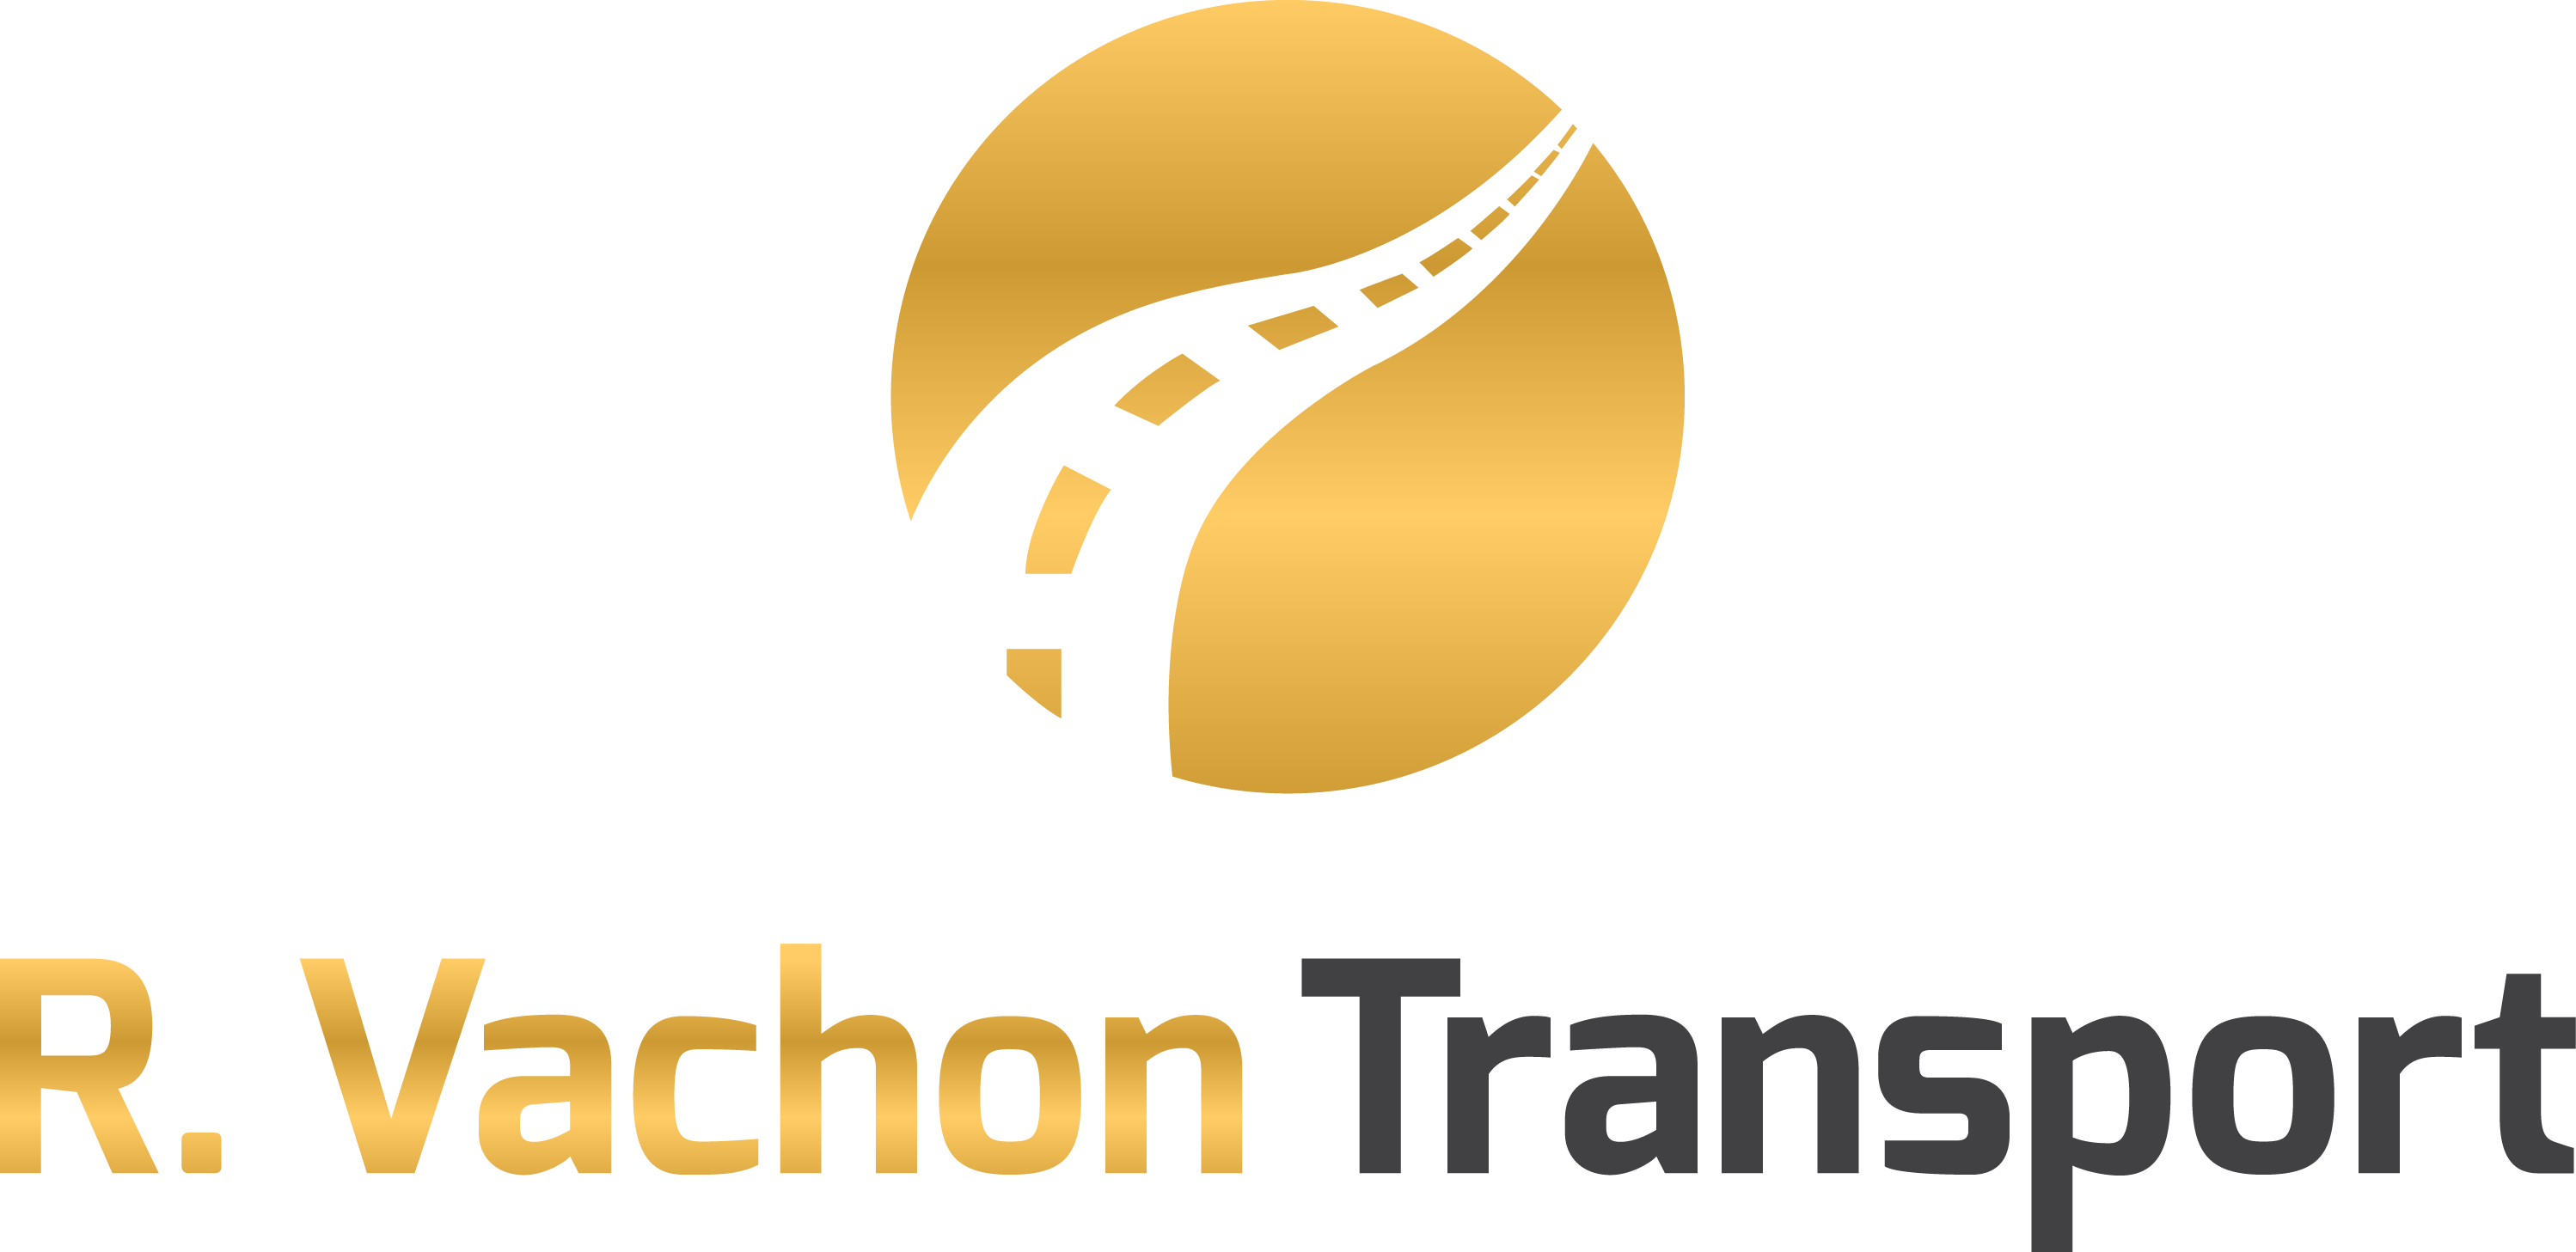 Rvachontransport